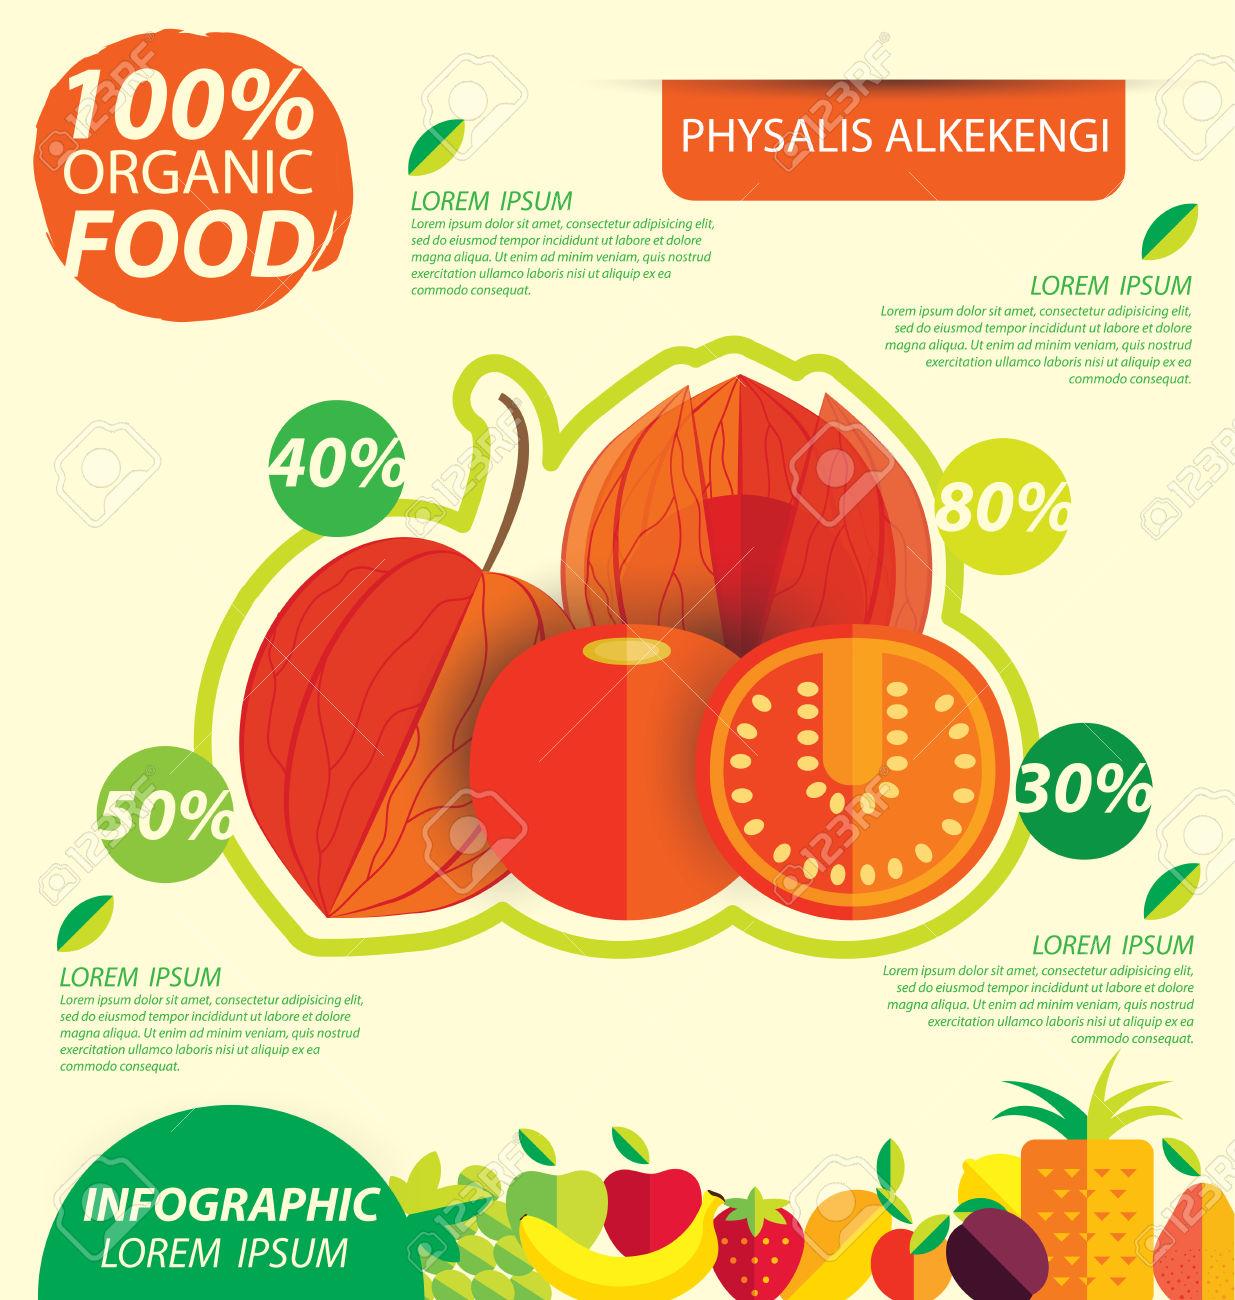 Physalis Alkekengi. Infographic Template. Vector Illustration.